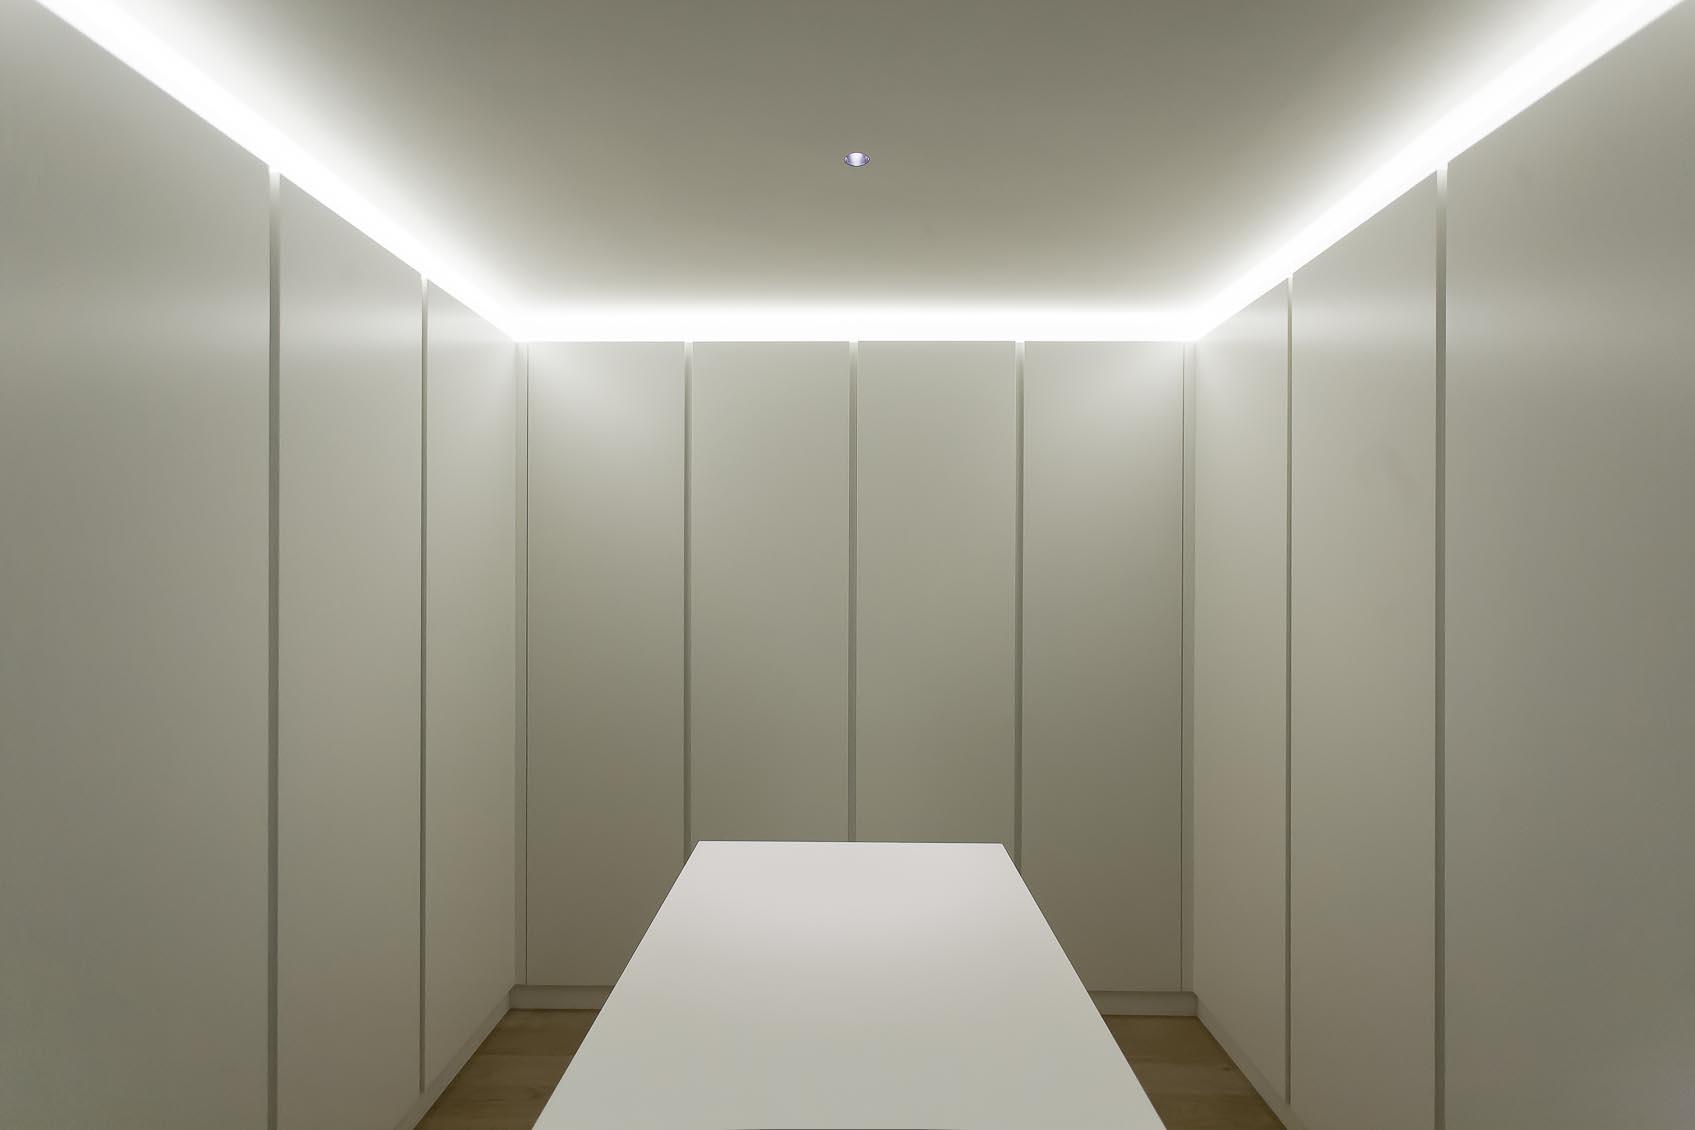 Verlichting Badkamer Led : Verlaagd plafond met verlichting free awesome free badkamer